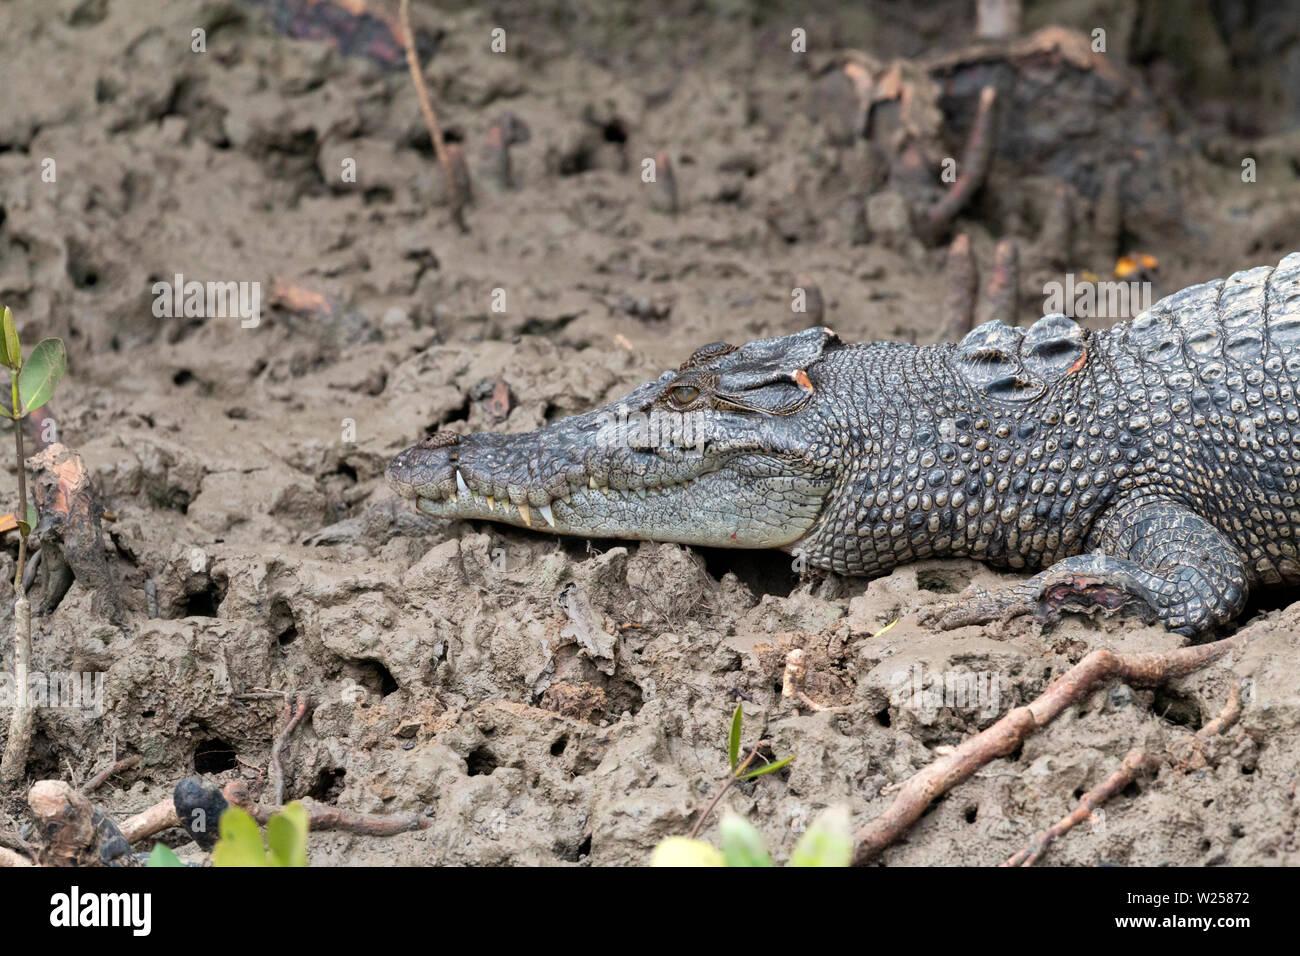 Saltwater Crocodile June 6th, 2019 Near Port Douglas, Australia - Stock Image